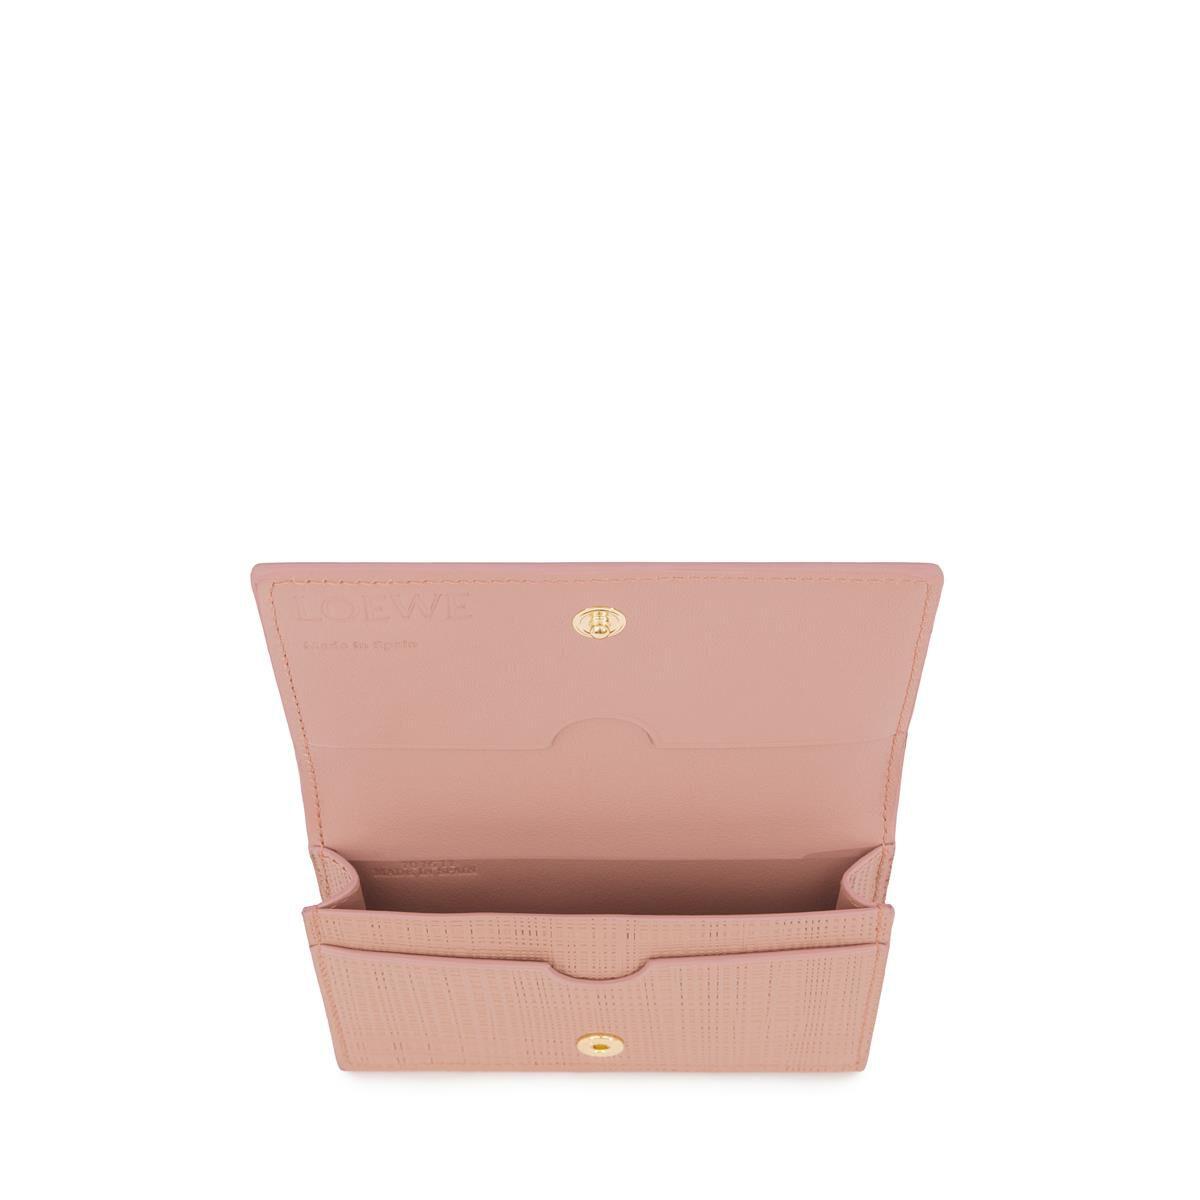 LOEWE Business Card Holder Blush all